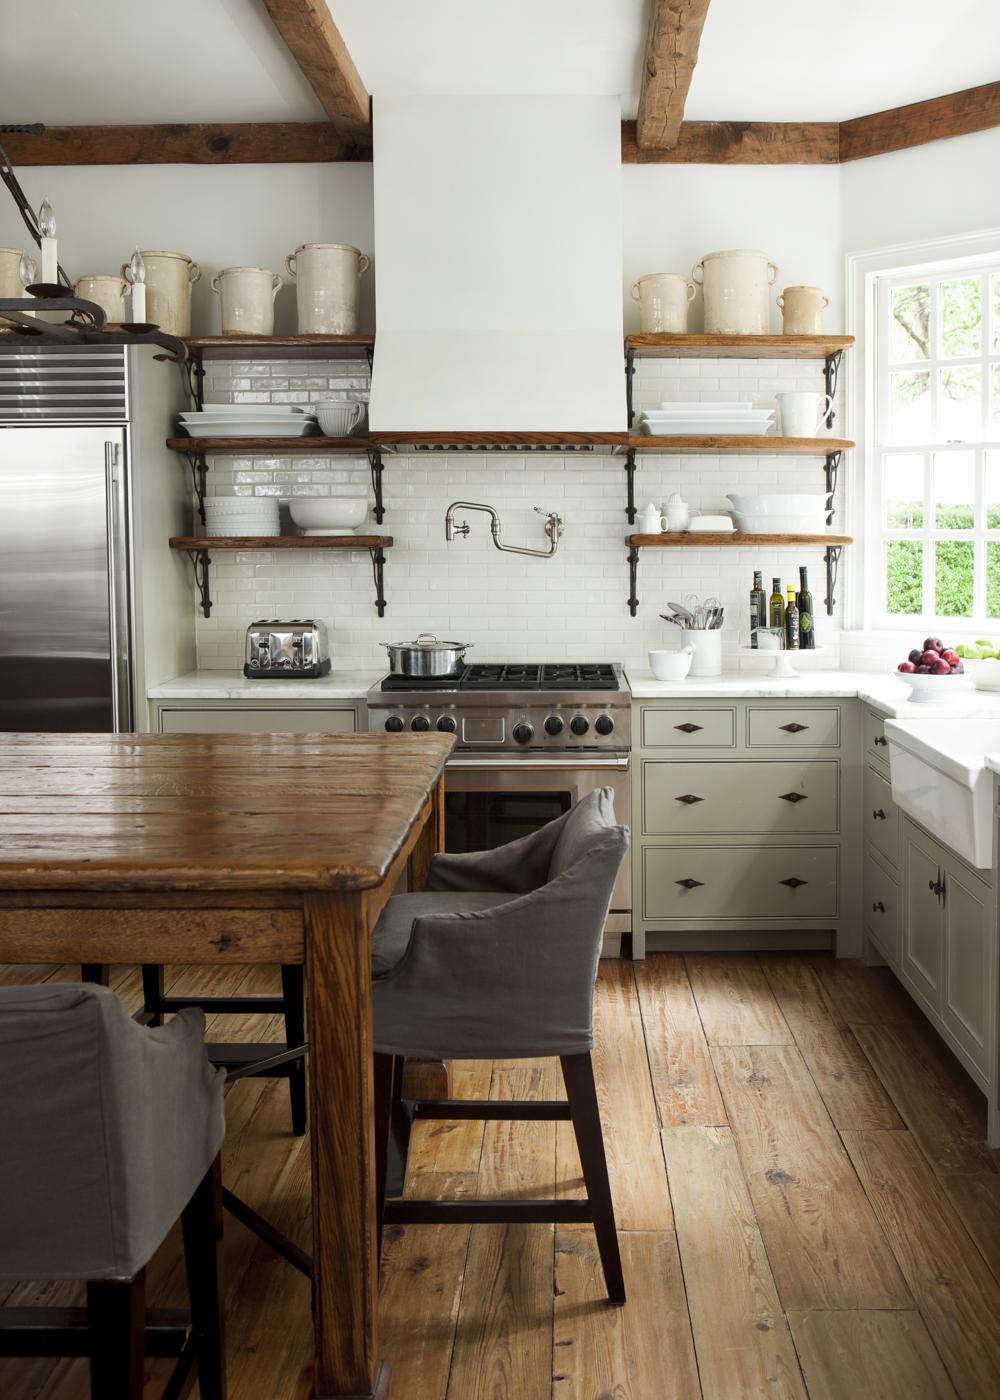 Designing a kitchen kitchen pinterest kitchen farmhouse